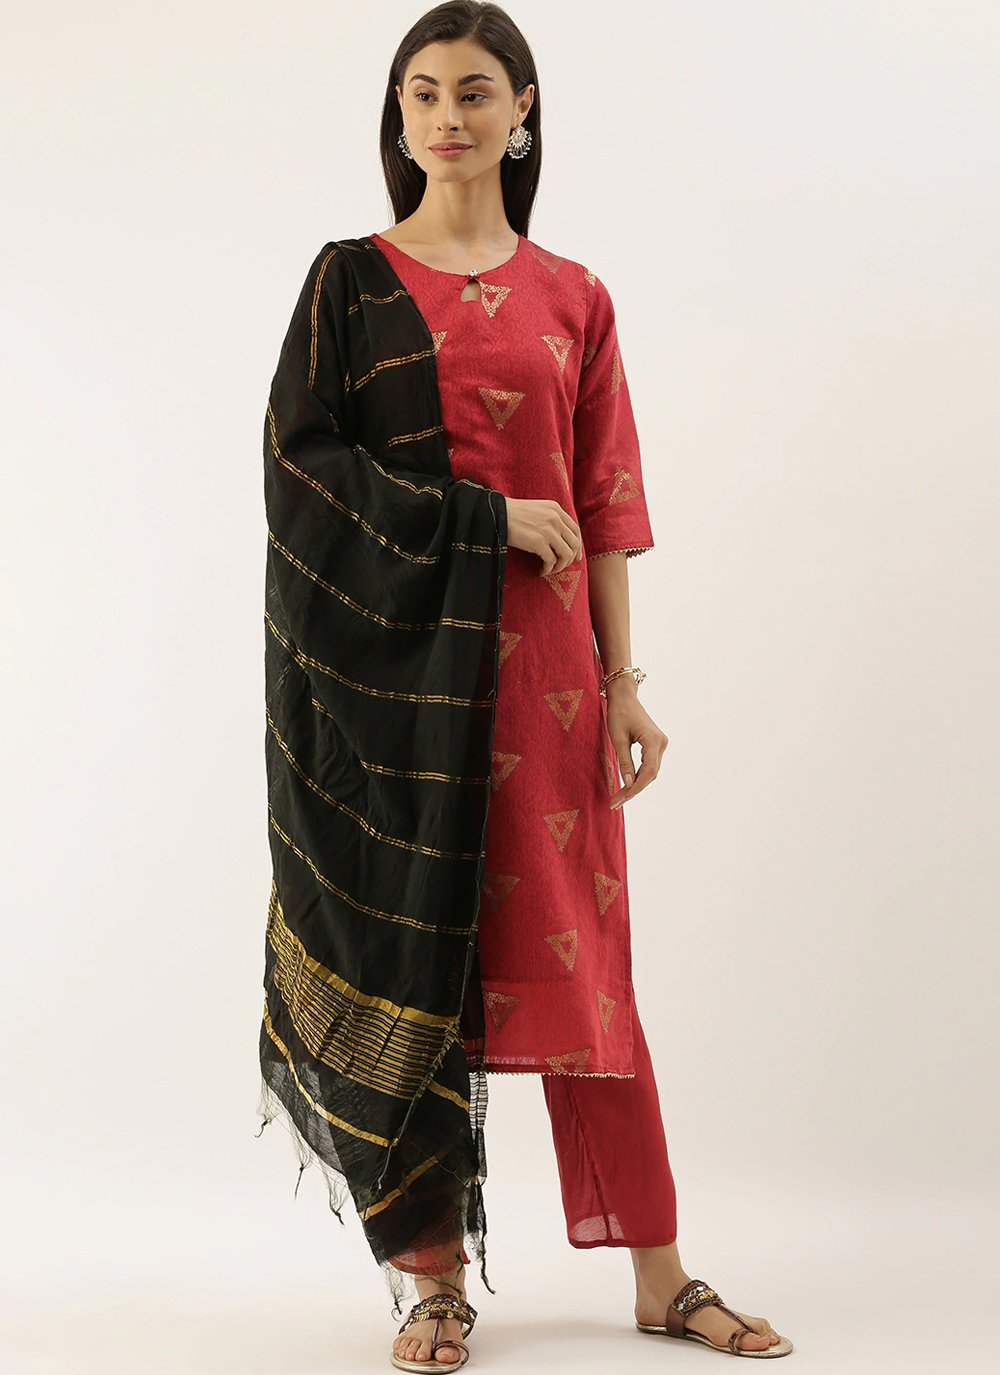 Abstract Print Chanderi Trendy Salwar Suit in Red